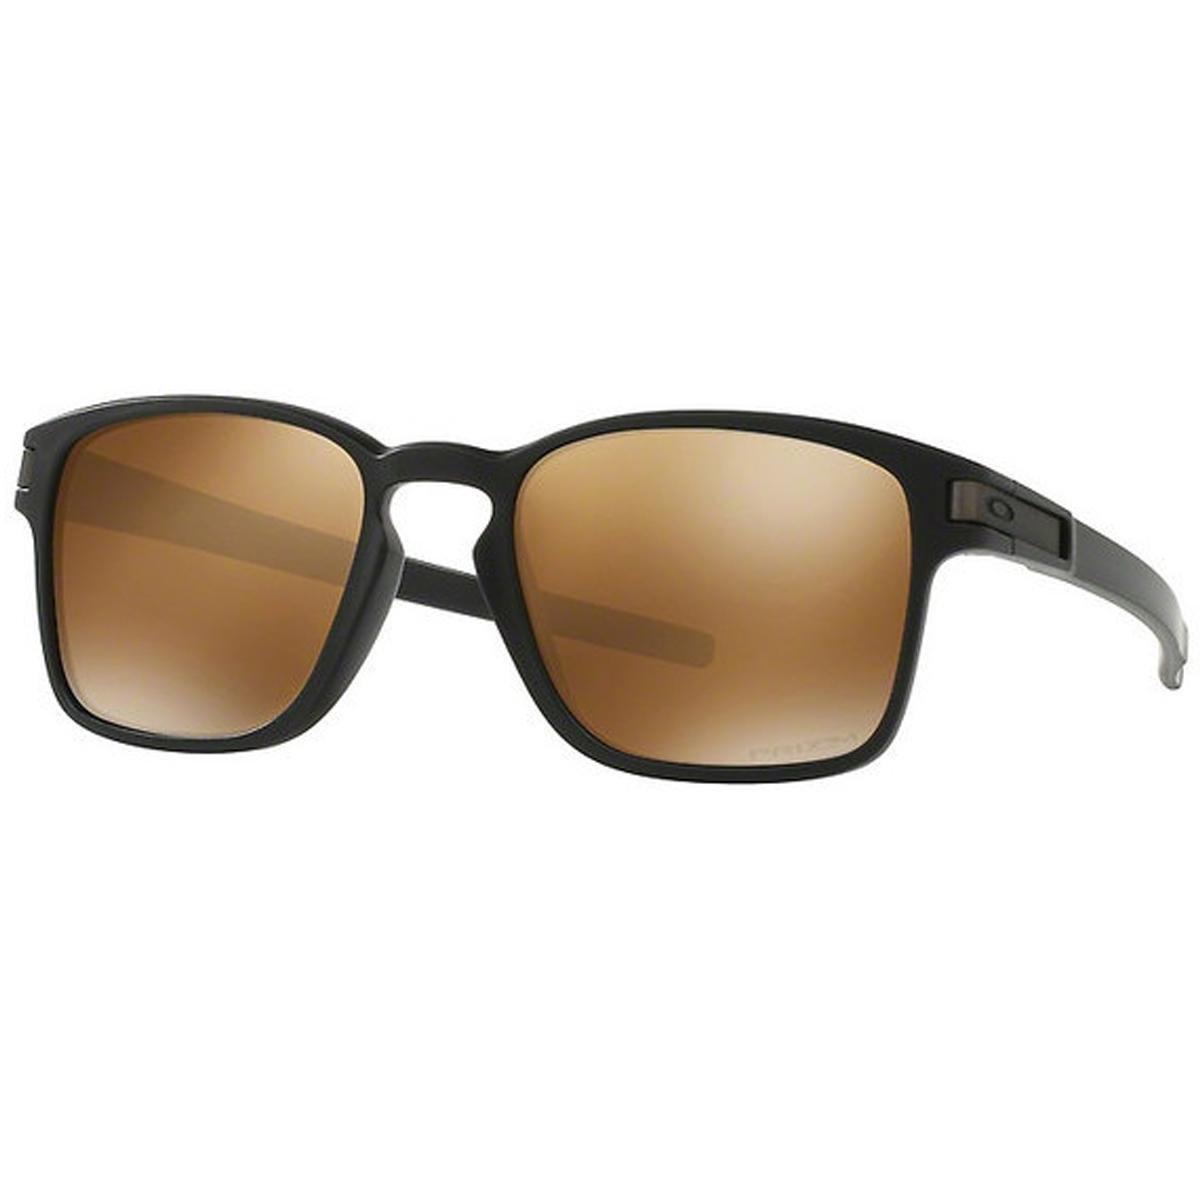 Óculos Oakley Latch Square - Compre Agora   Netshoes 8de5b3da14